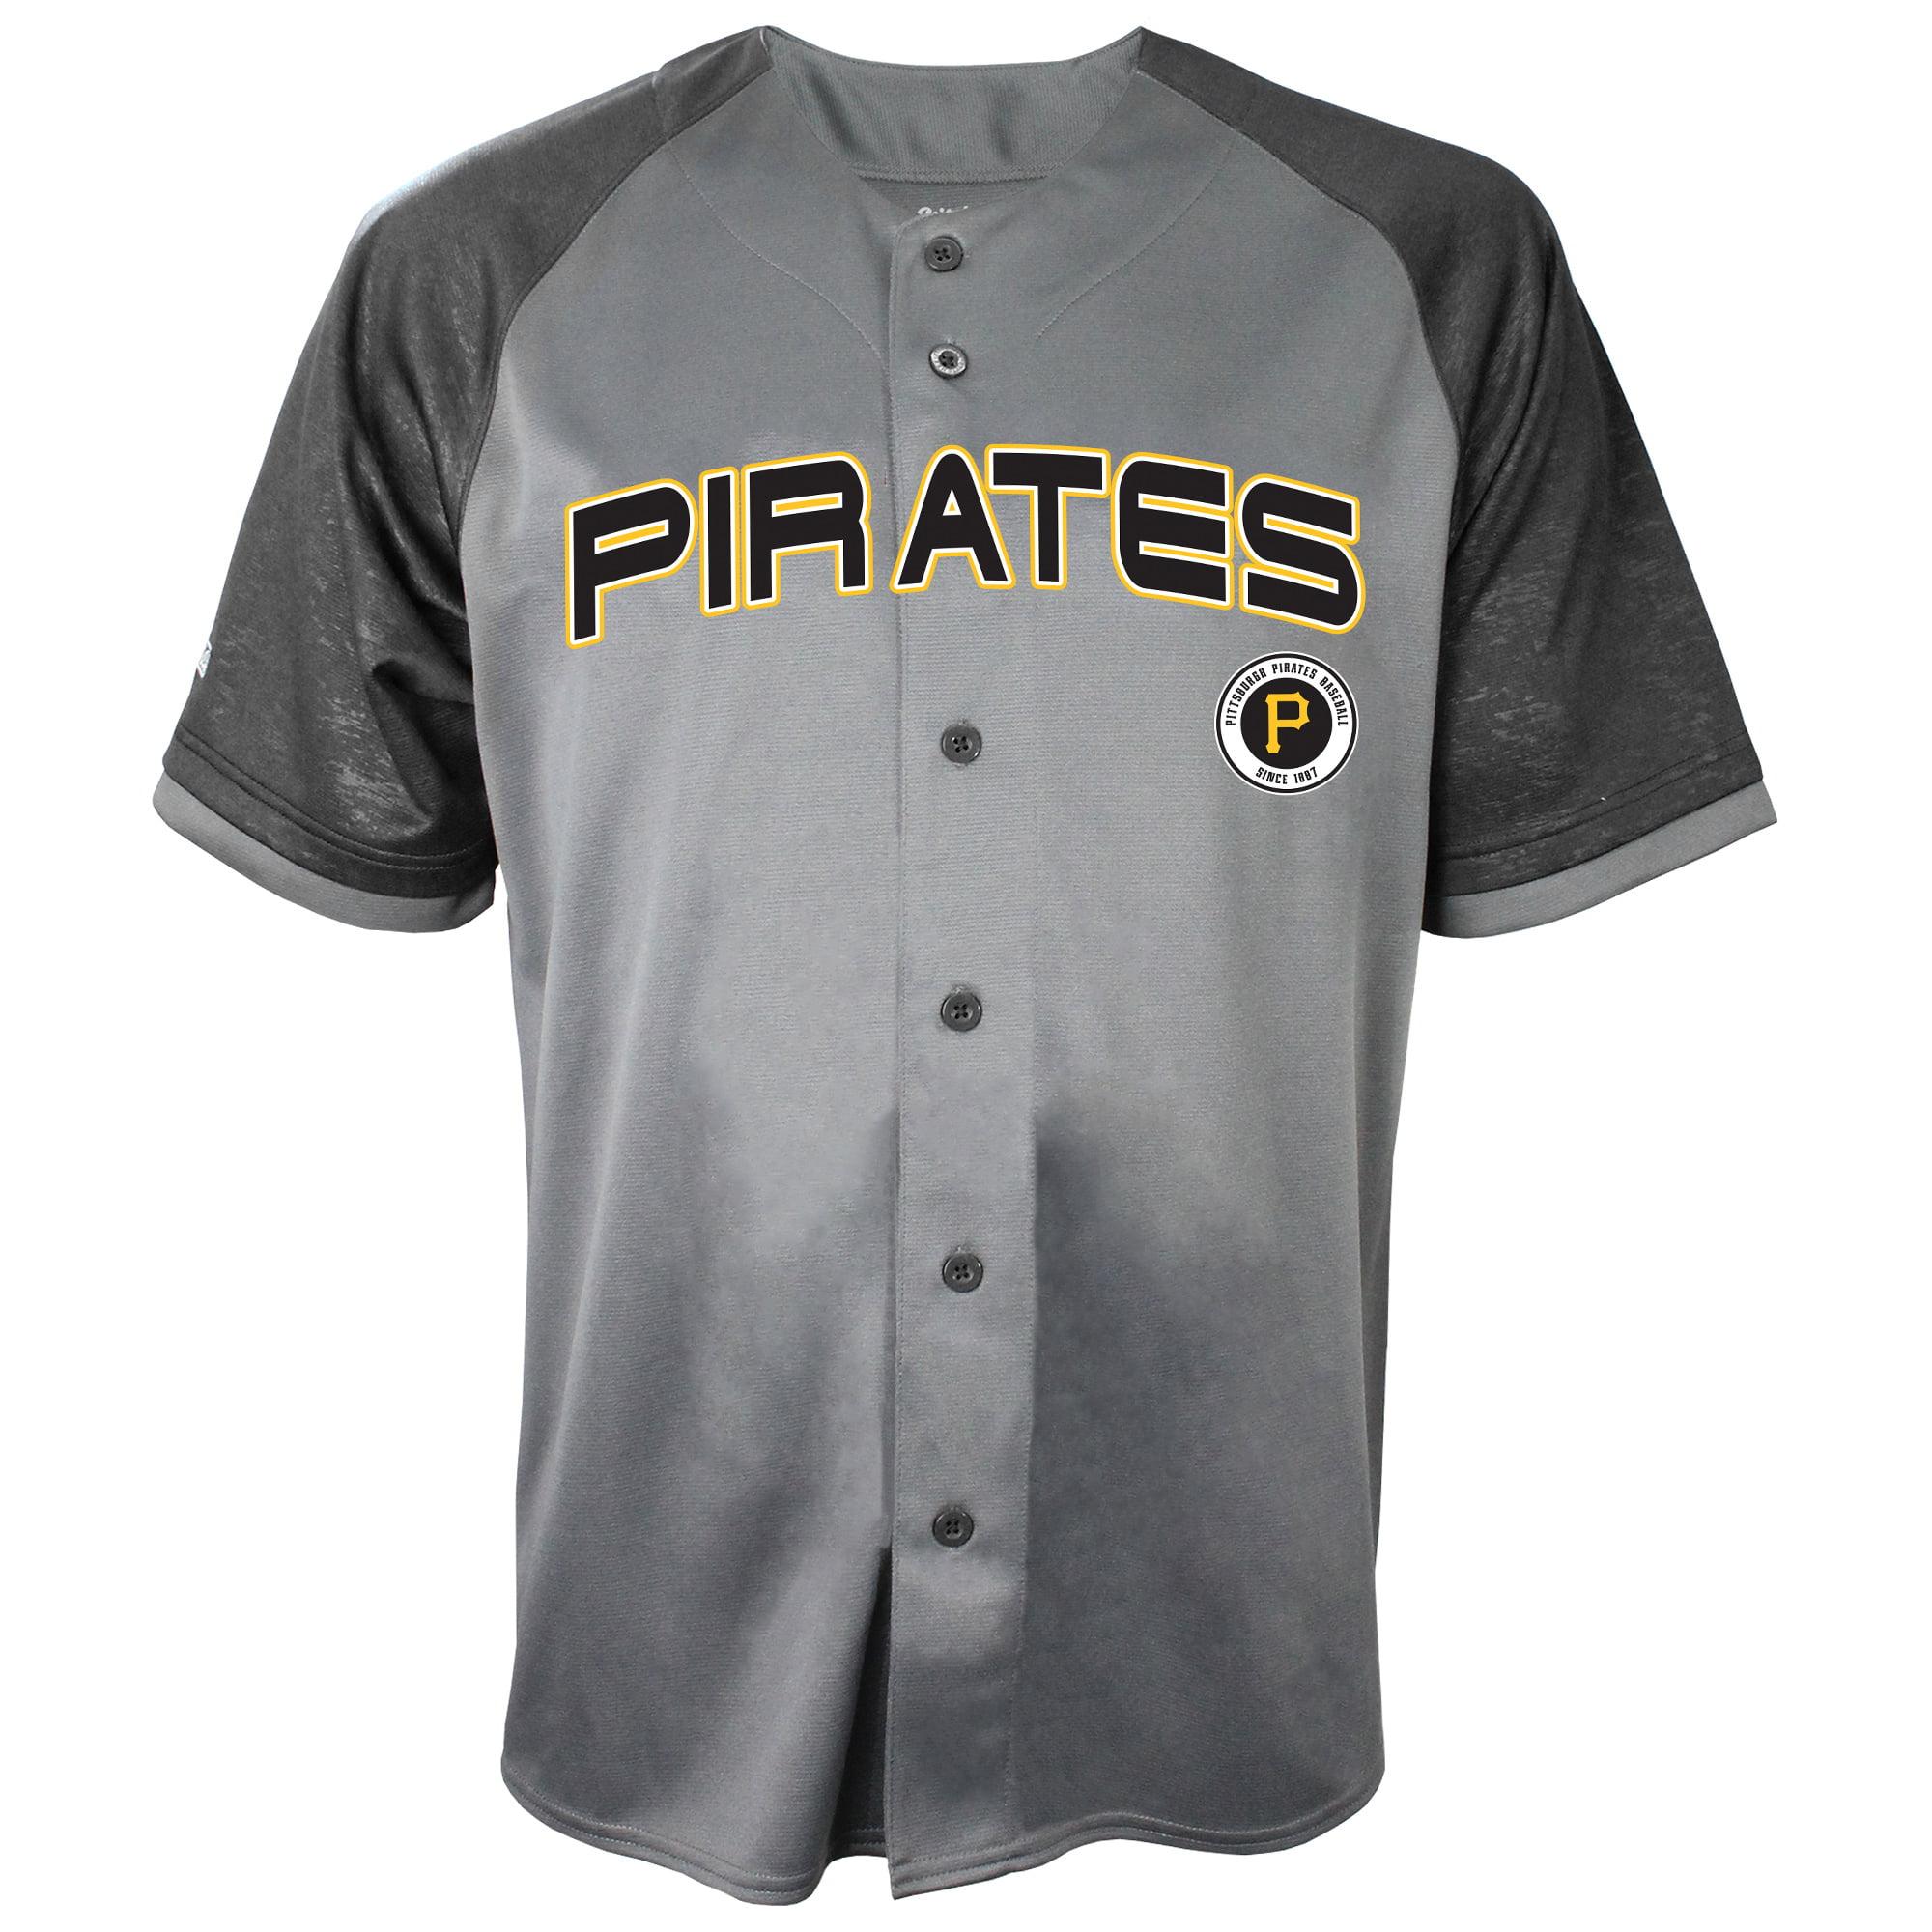 Pittsburgh Pirates Stitches Glitch Jersey - Charcoal/Black